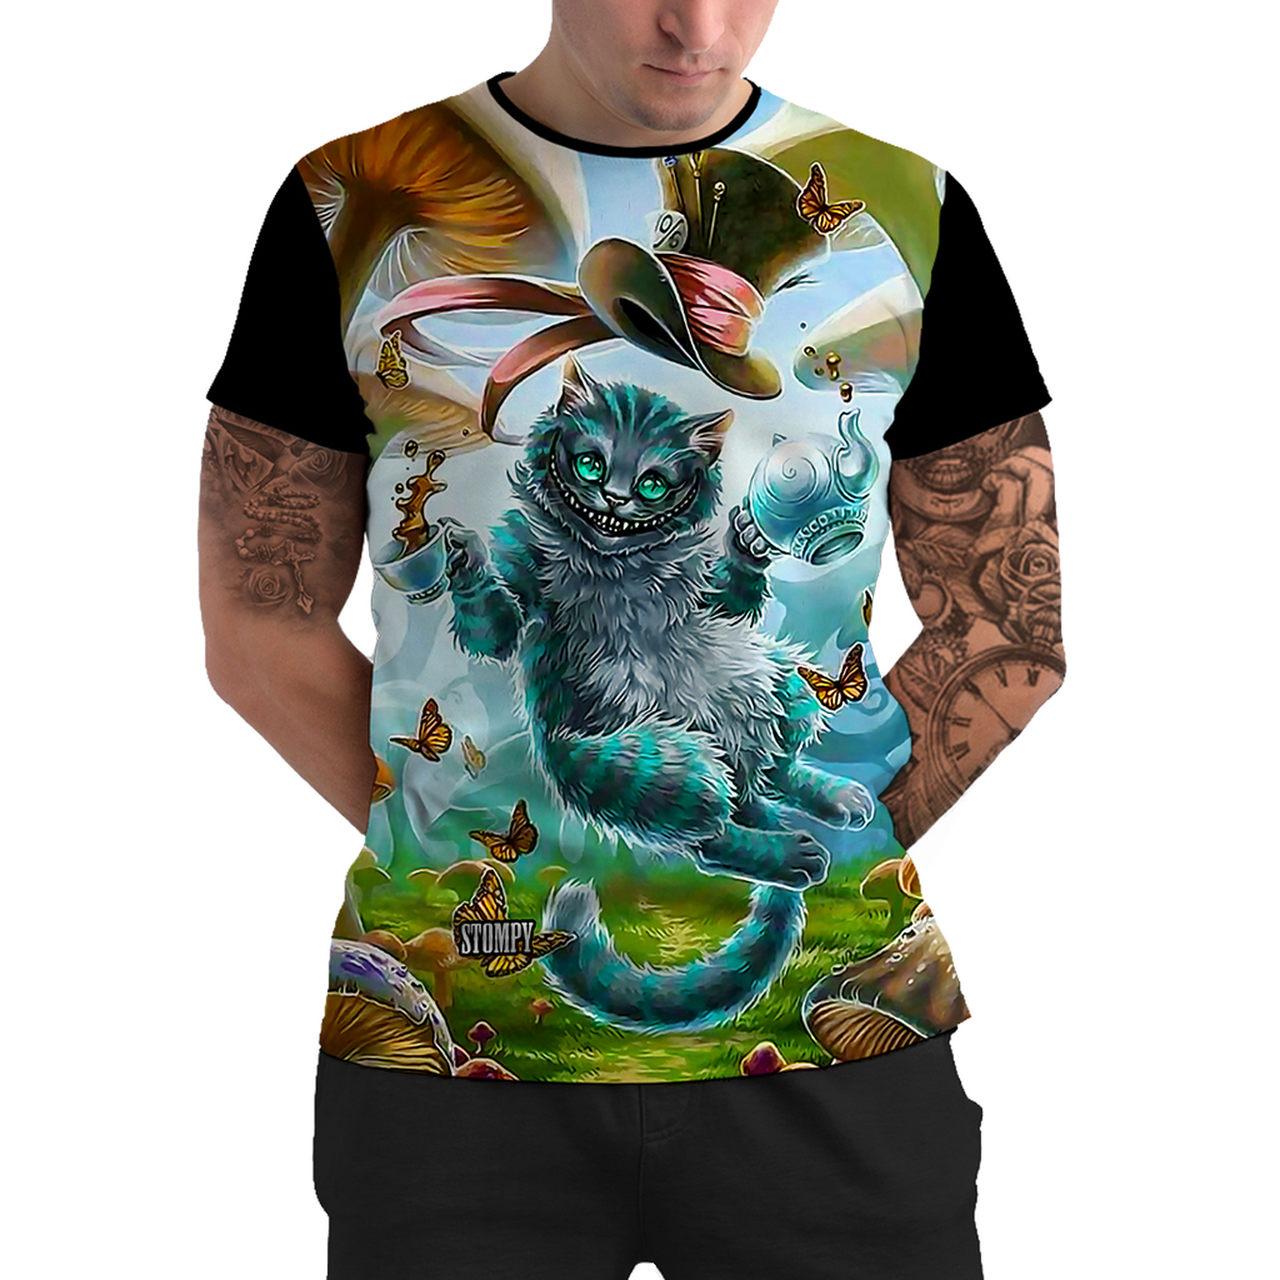 Stompy Camiseta Manga Curta Psicodelica Modelo 76